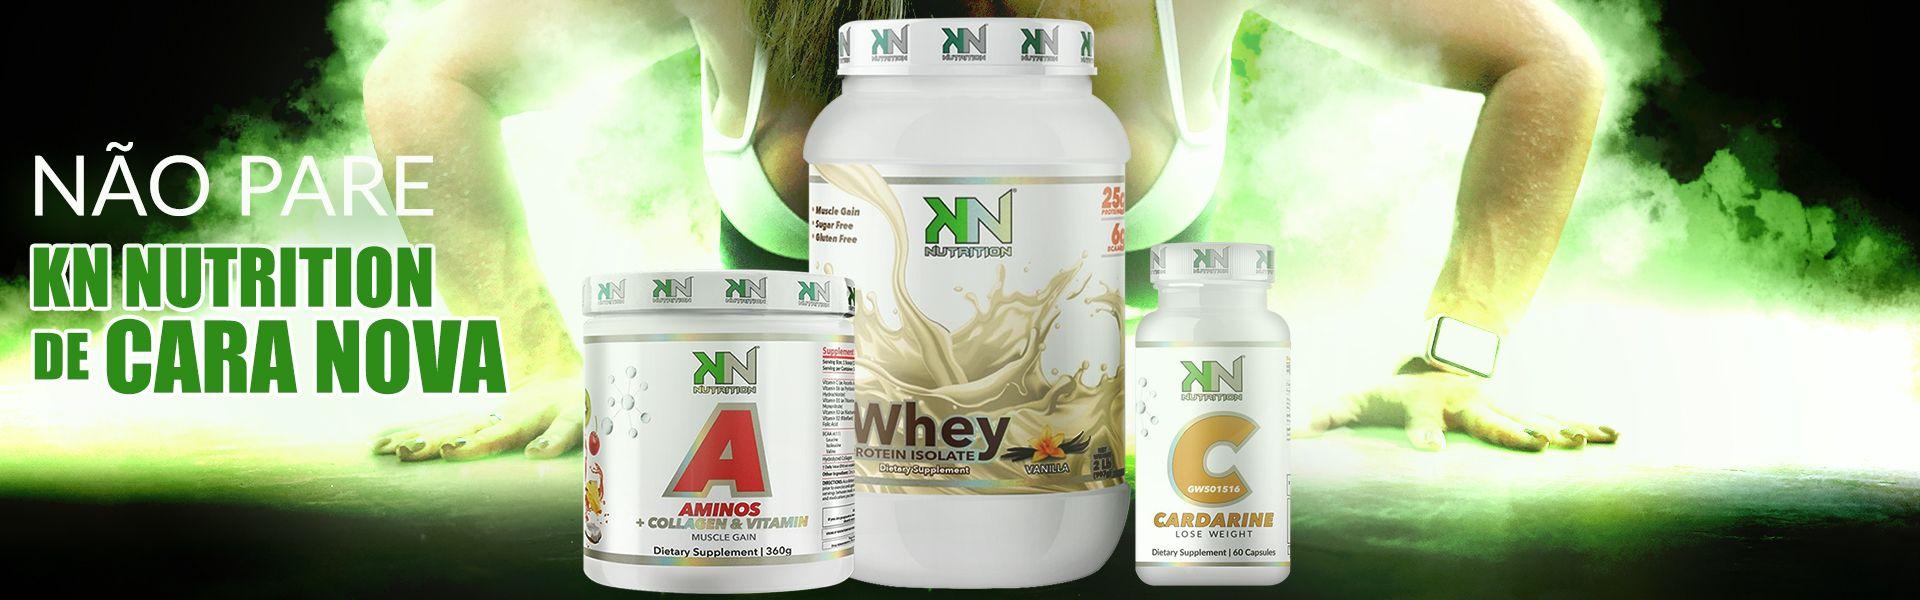 KN Nutrition - Sua loja de suplementos online!